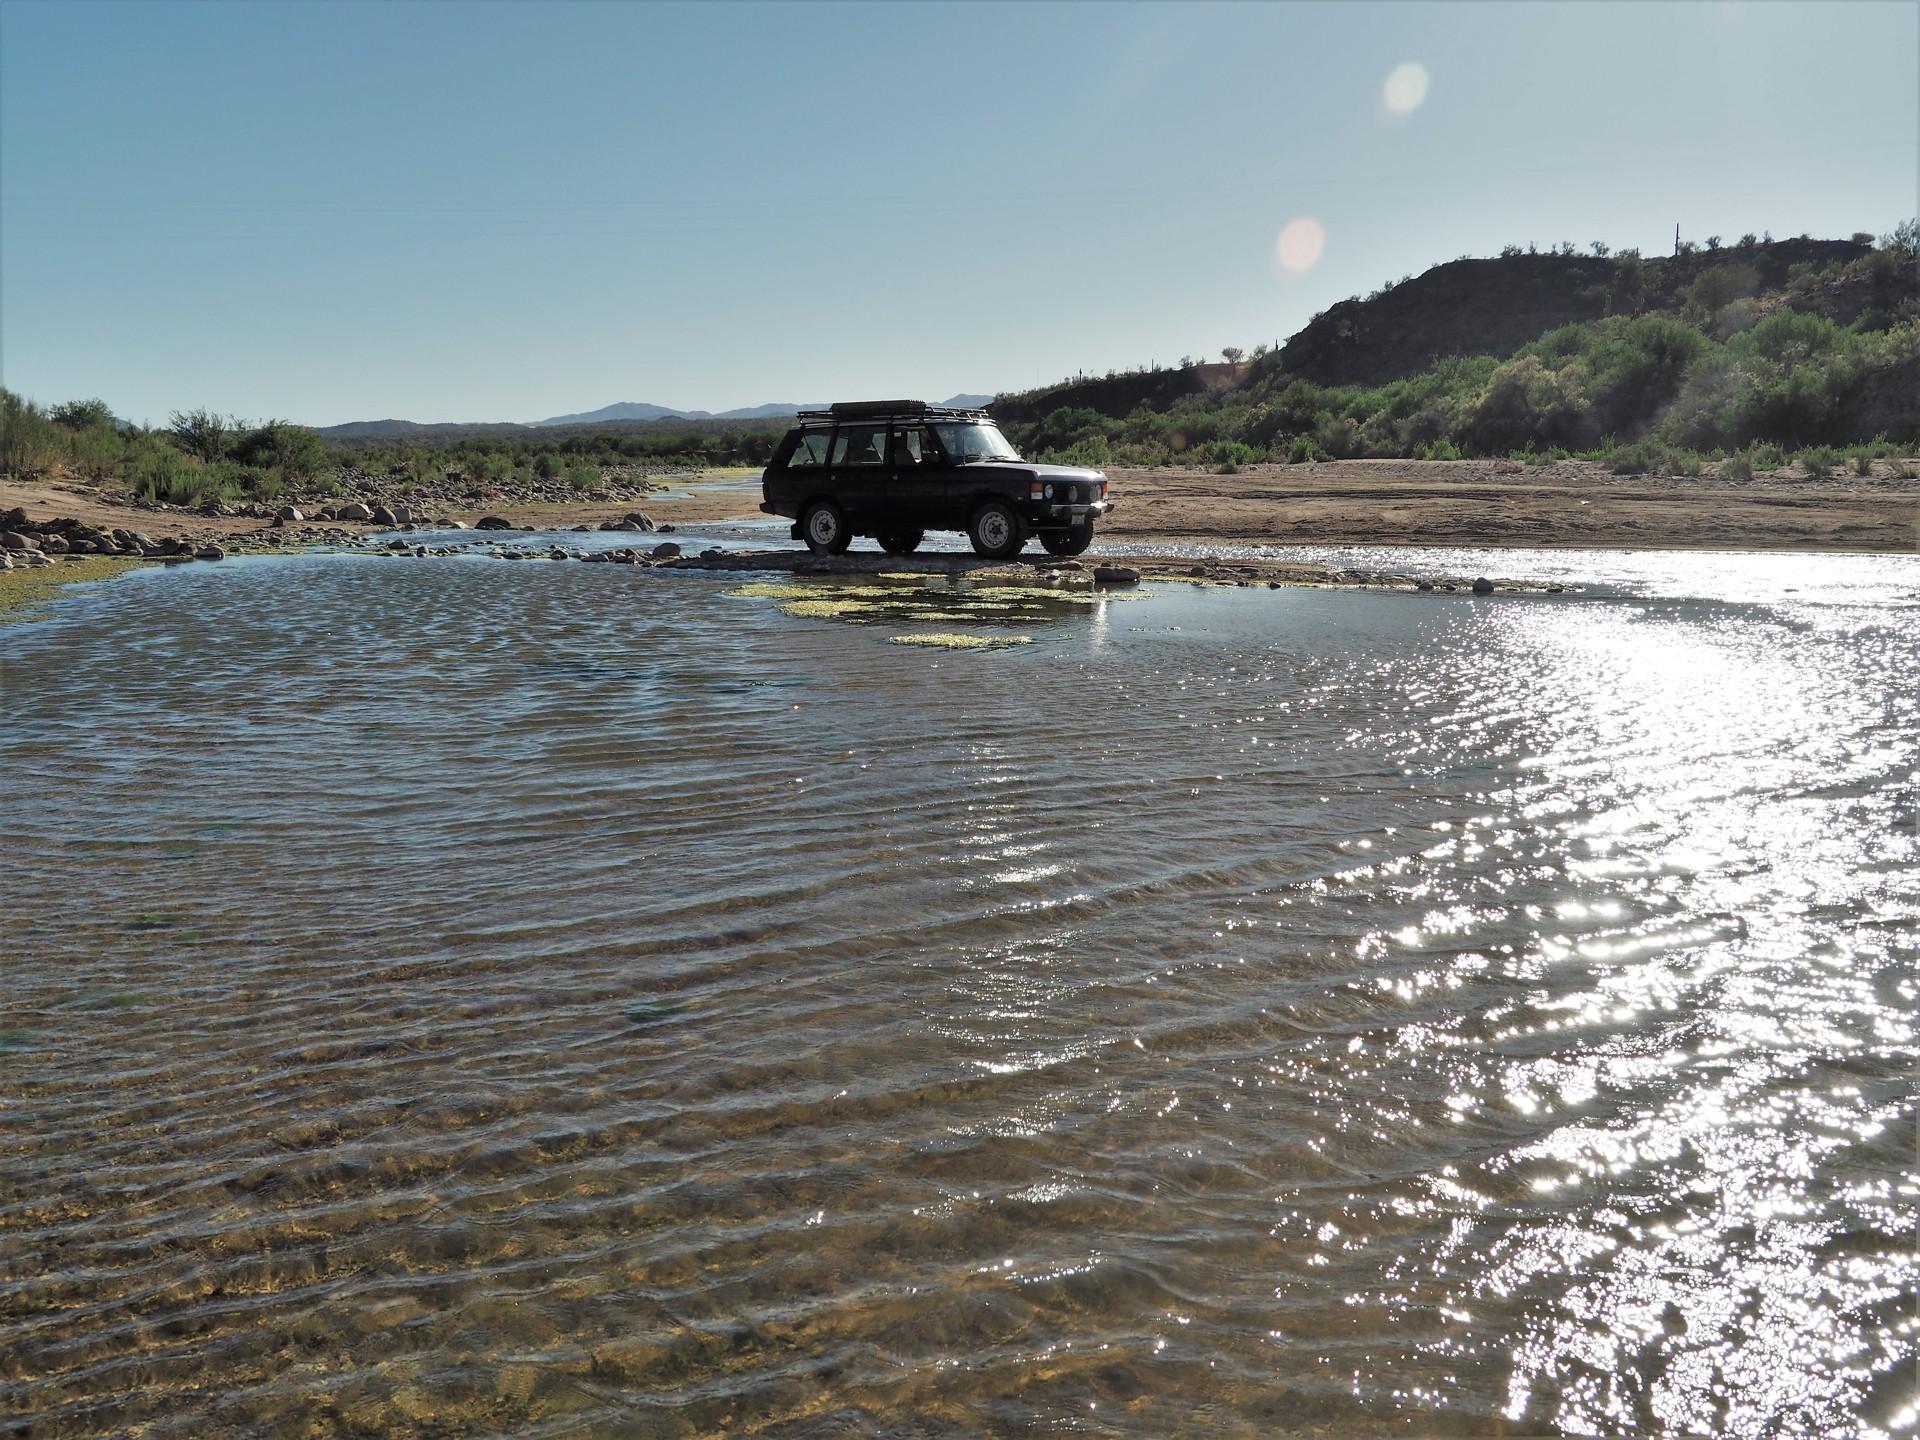 Аризона исподтишка, или КоронаРото